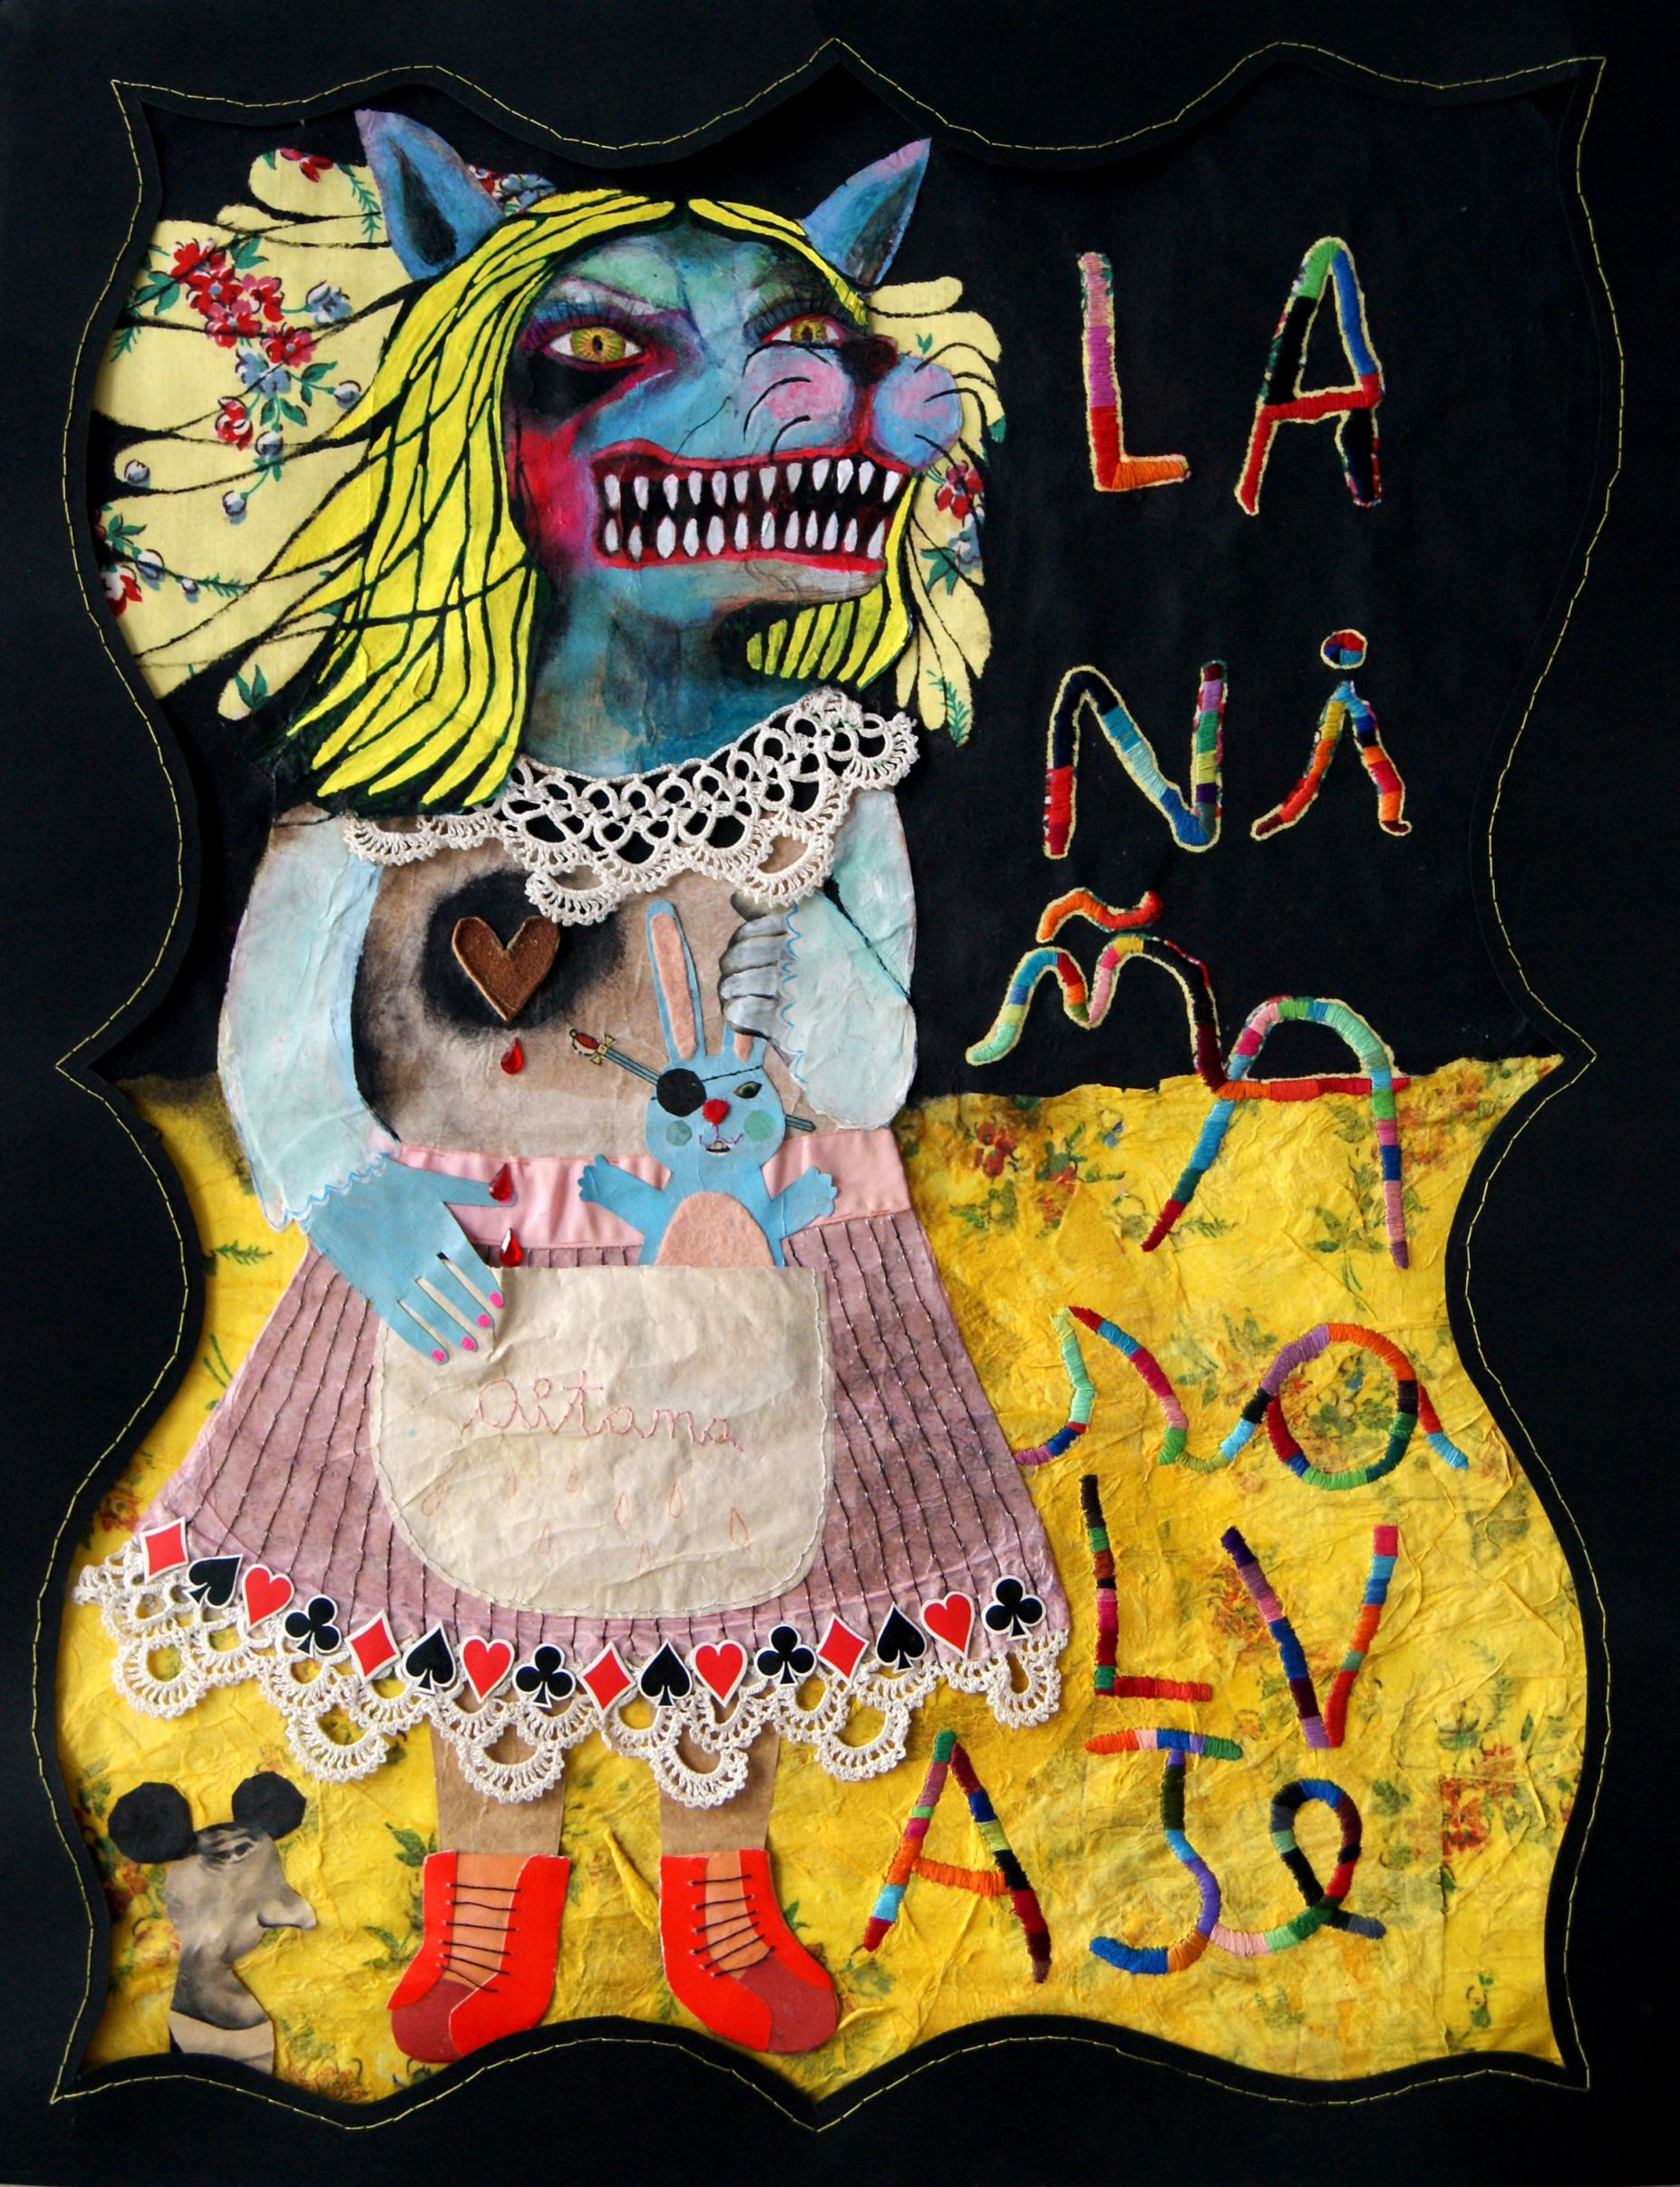 La niña salvaje (2013) - Aitana Bernabé - Piscaballito